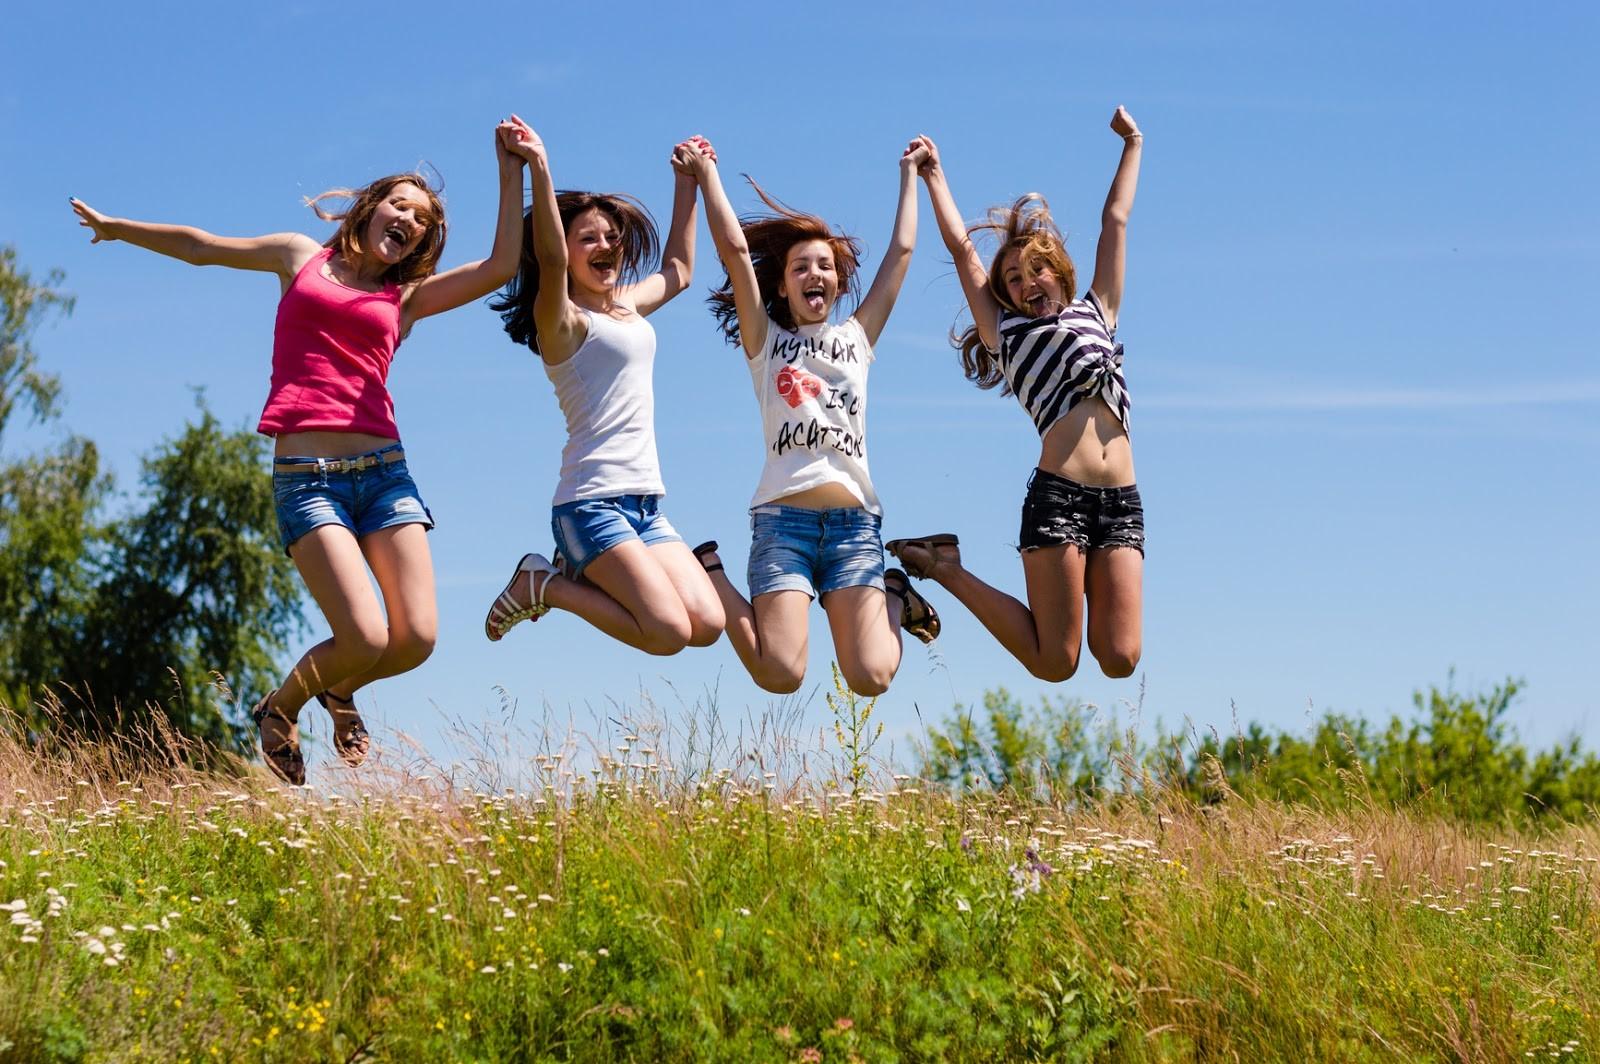 Kenapa sih Kalsium Itu Penting untuk Remaja yang Aktif?